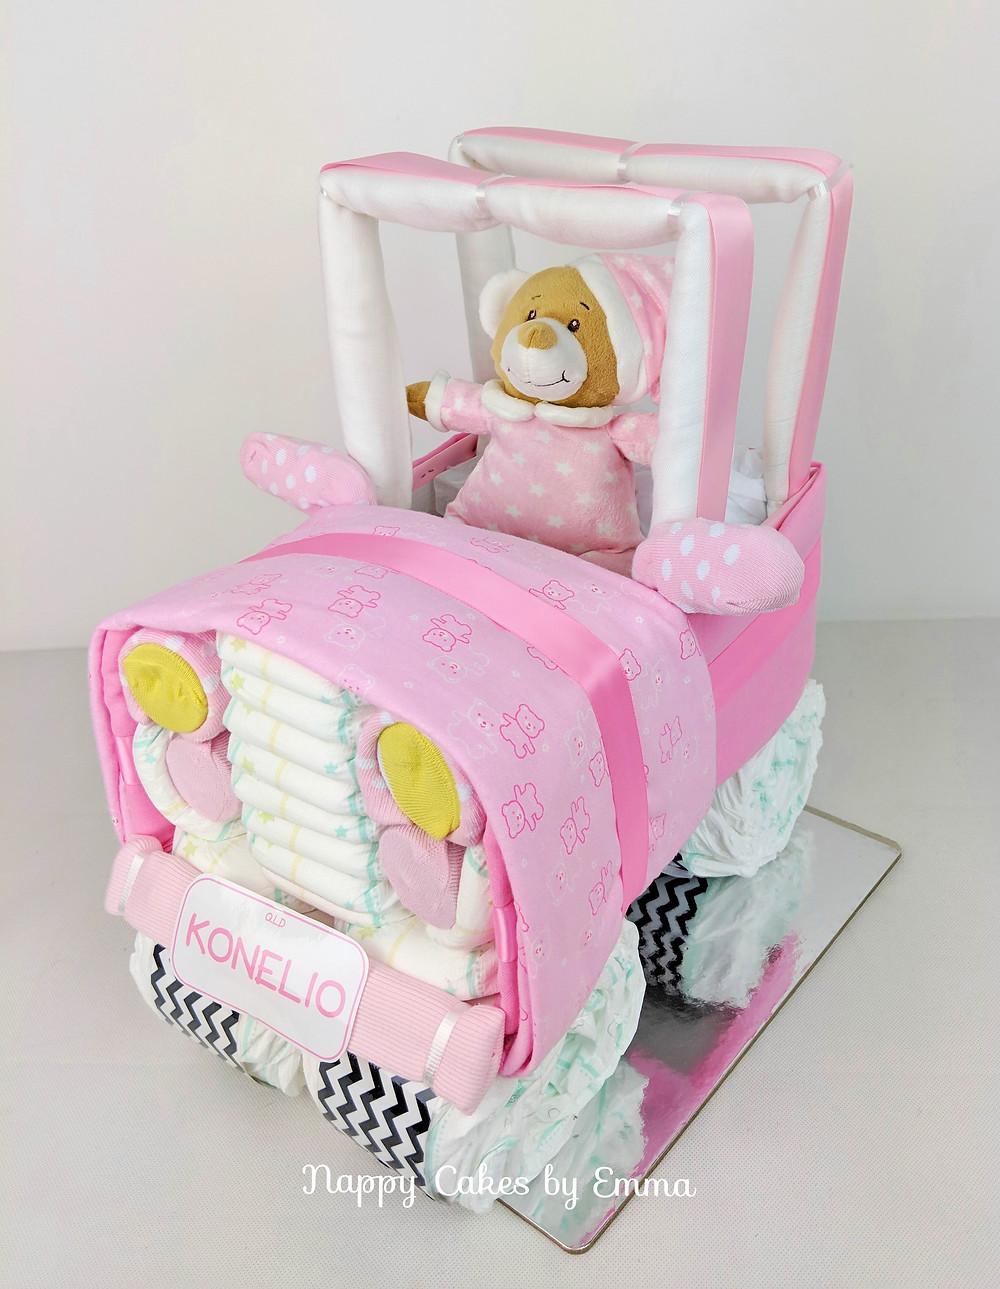 Baby girl nappy jeep - nappy cakes brisbane